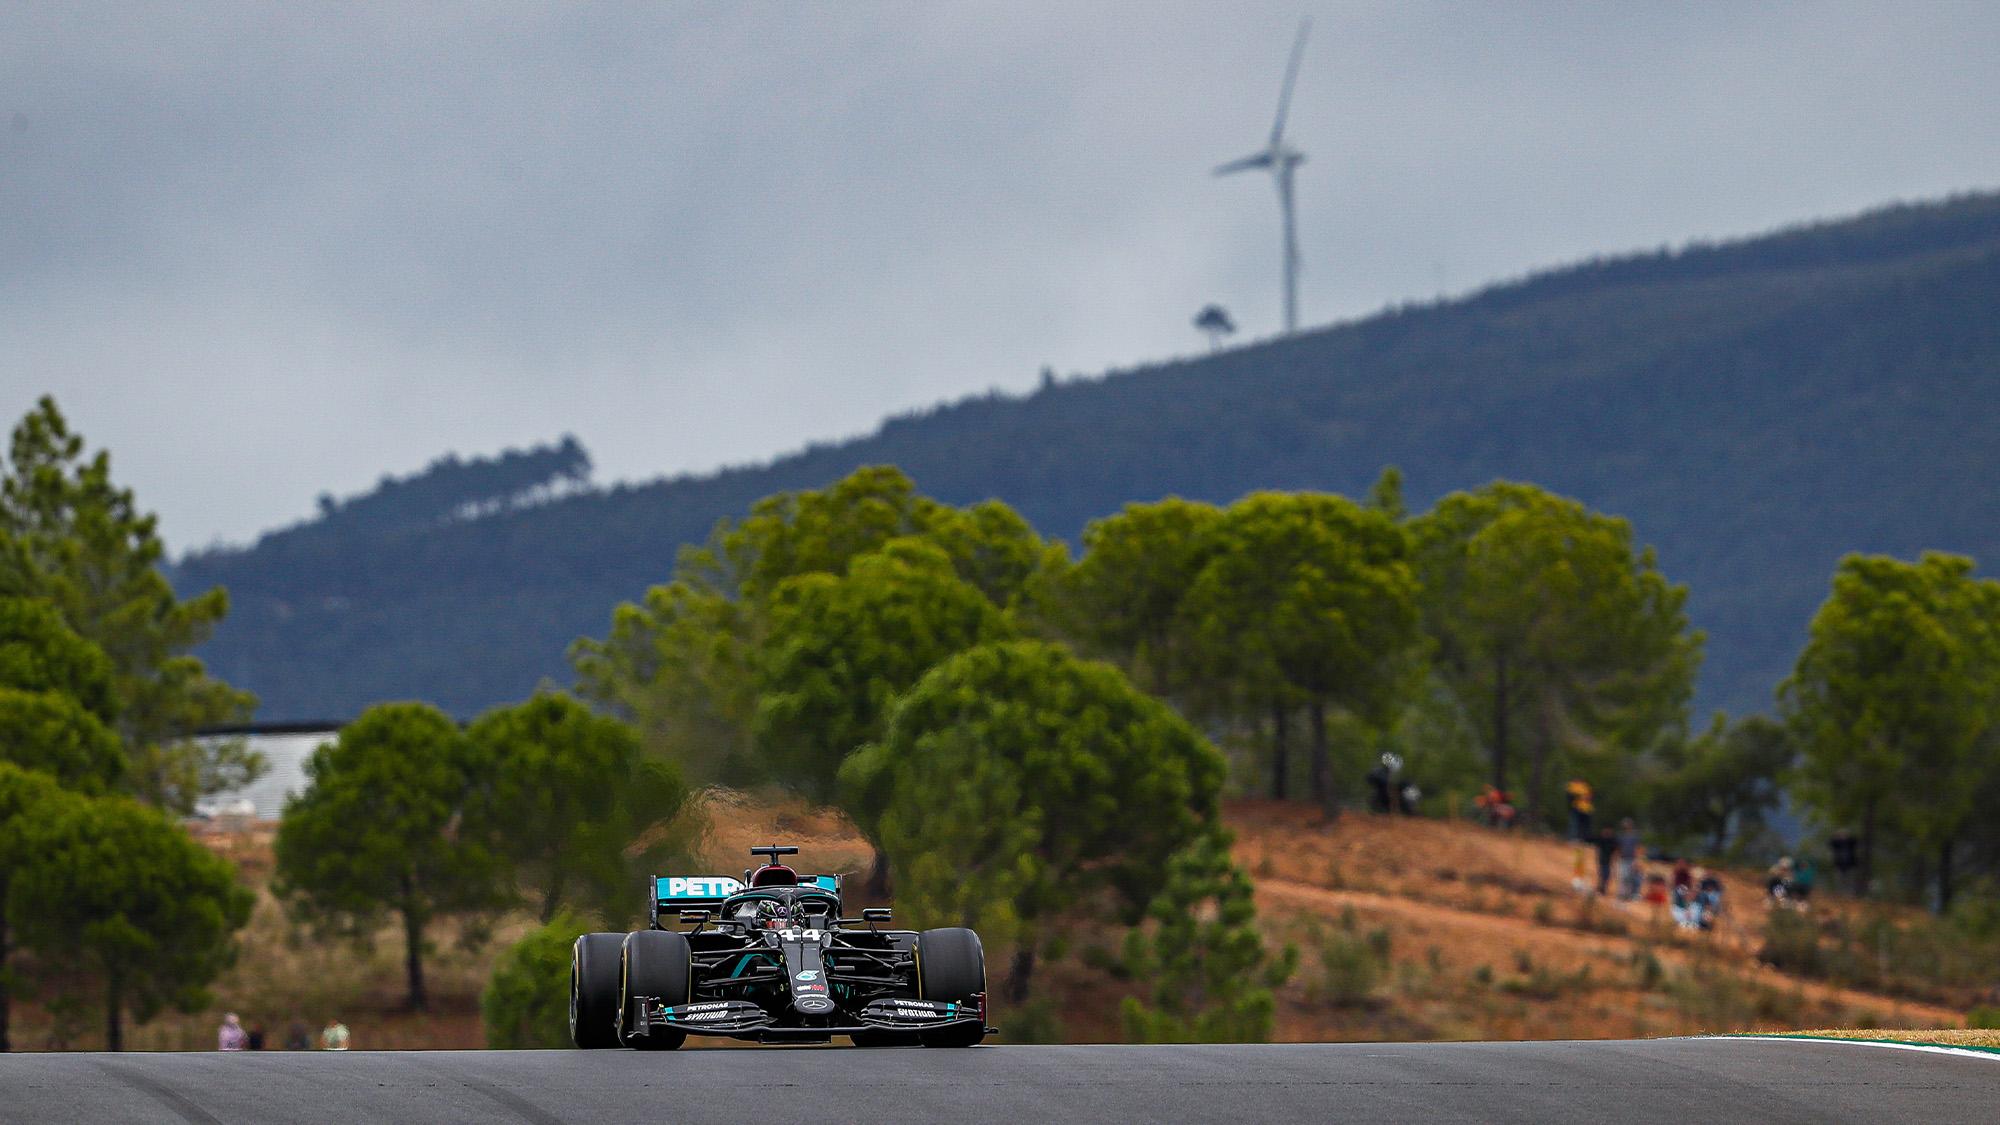 Lewis Hamilton's Mercedes on track at Portimao during the 2020 F1 Portuguese Grand Prix